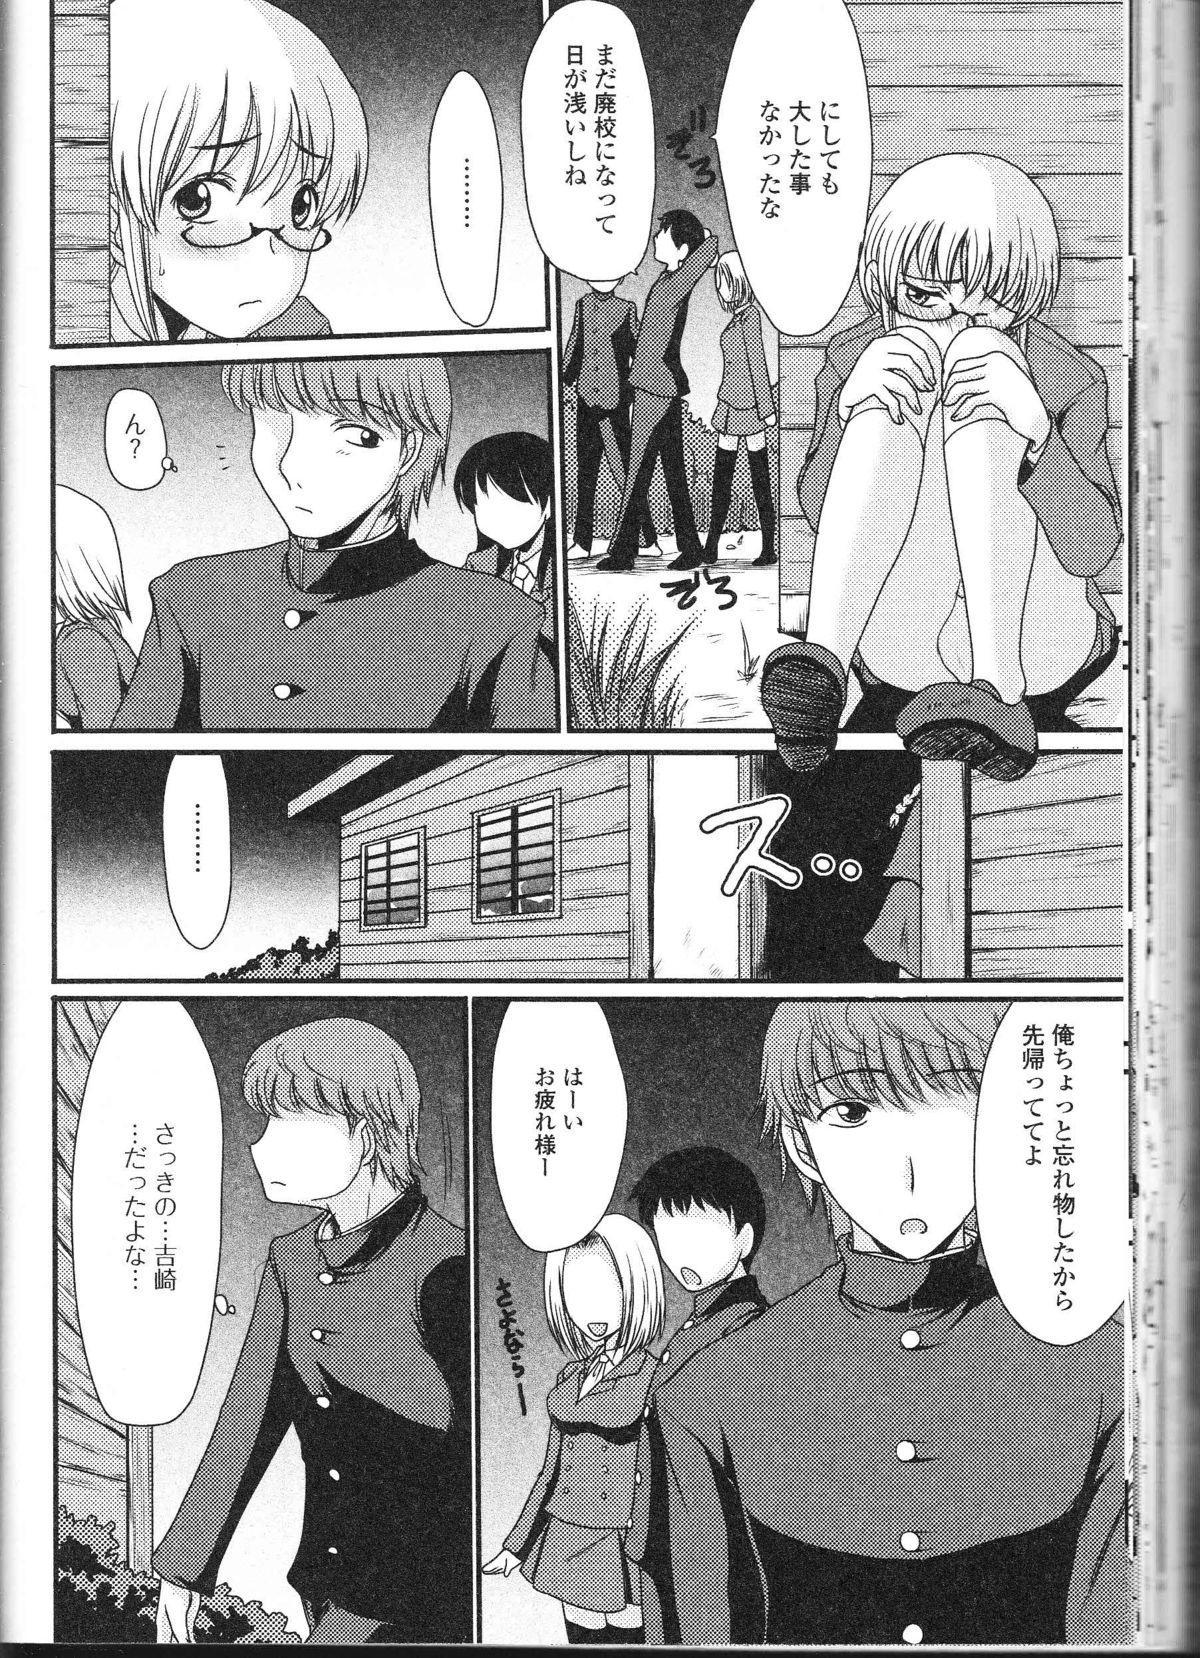 Nozoite wa Ikenai 9 - Do Not Peep! 9 114